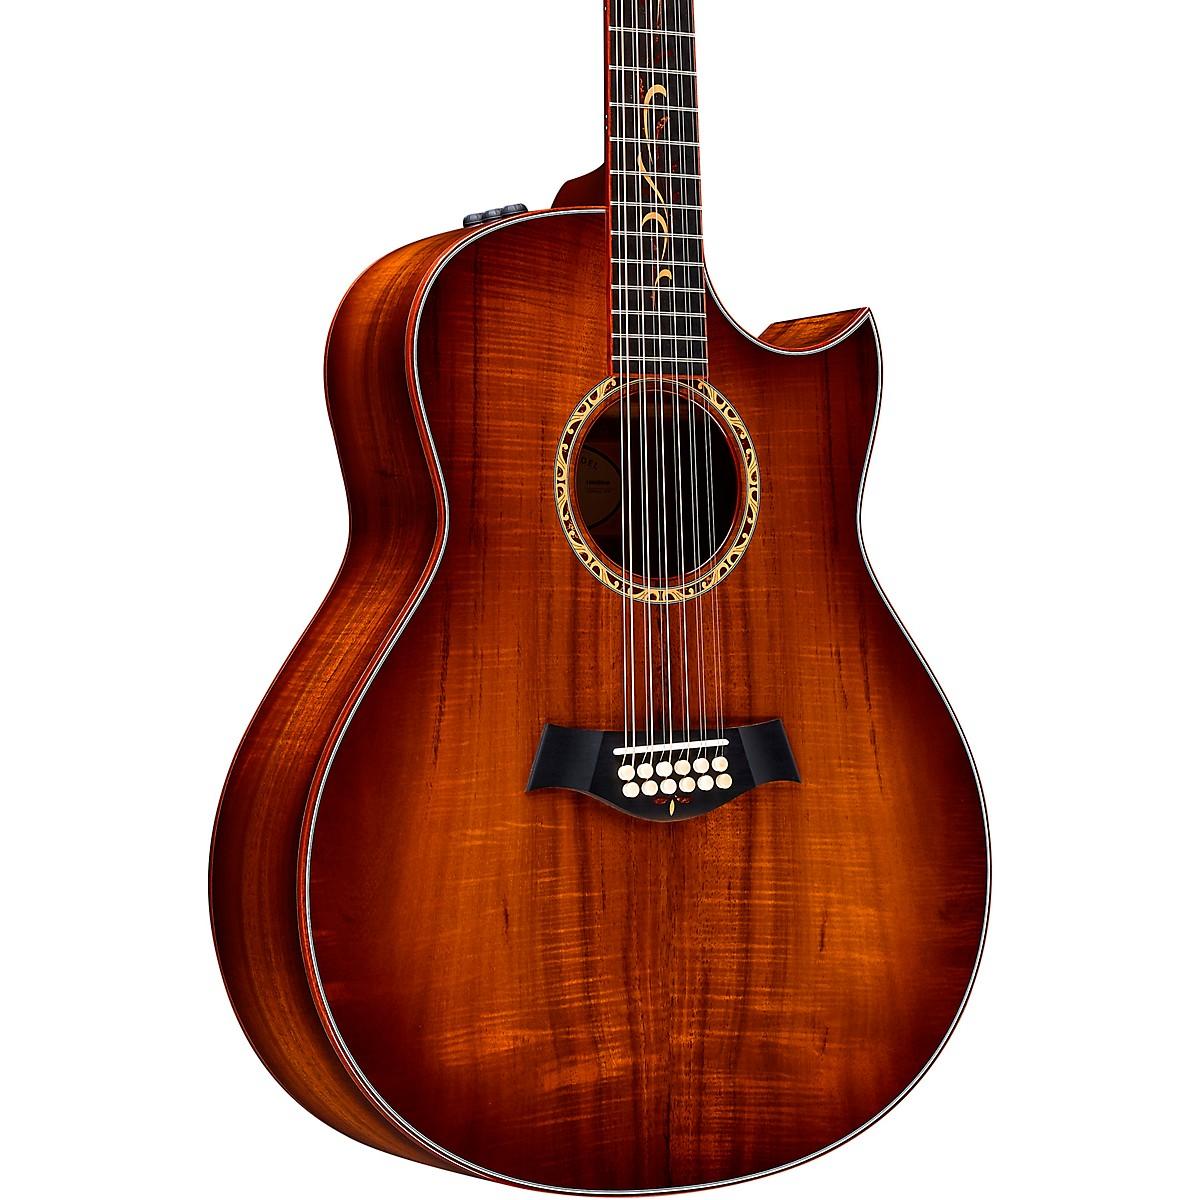 Taylor Custom Grand Orchestra 12-String #11094 A-Grade Koa Acoustic-Electric Guitar